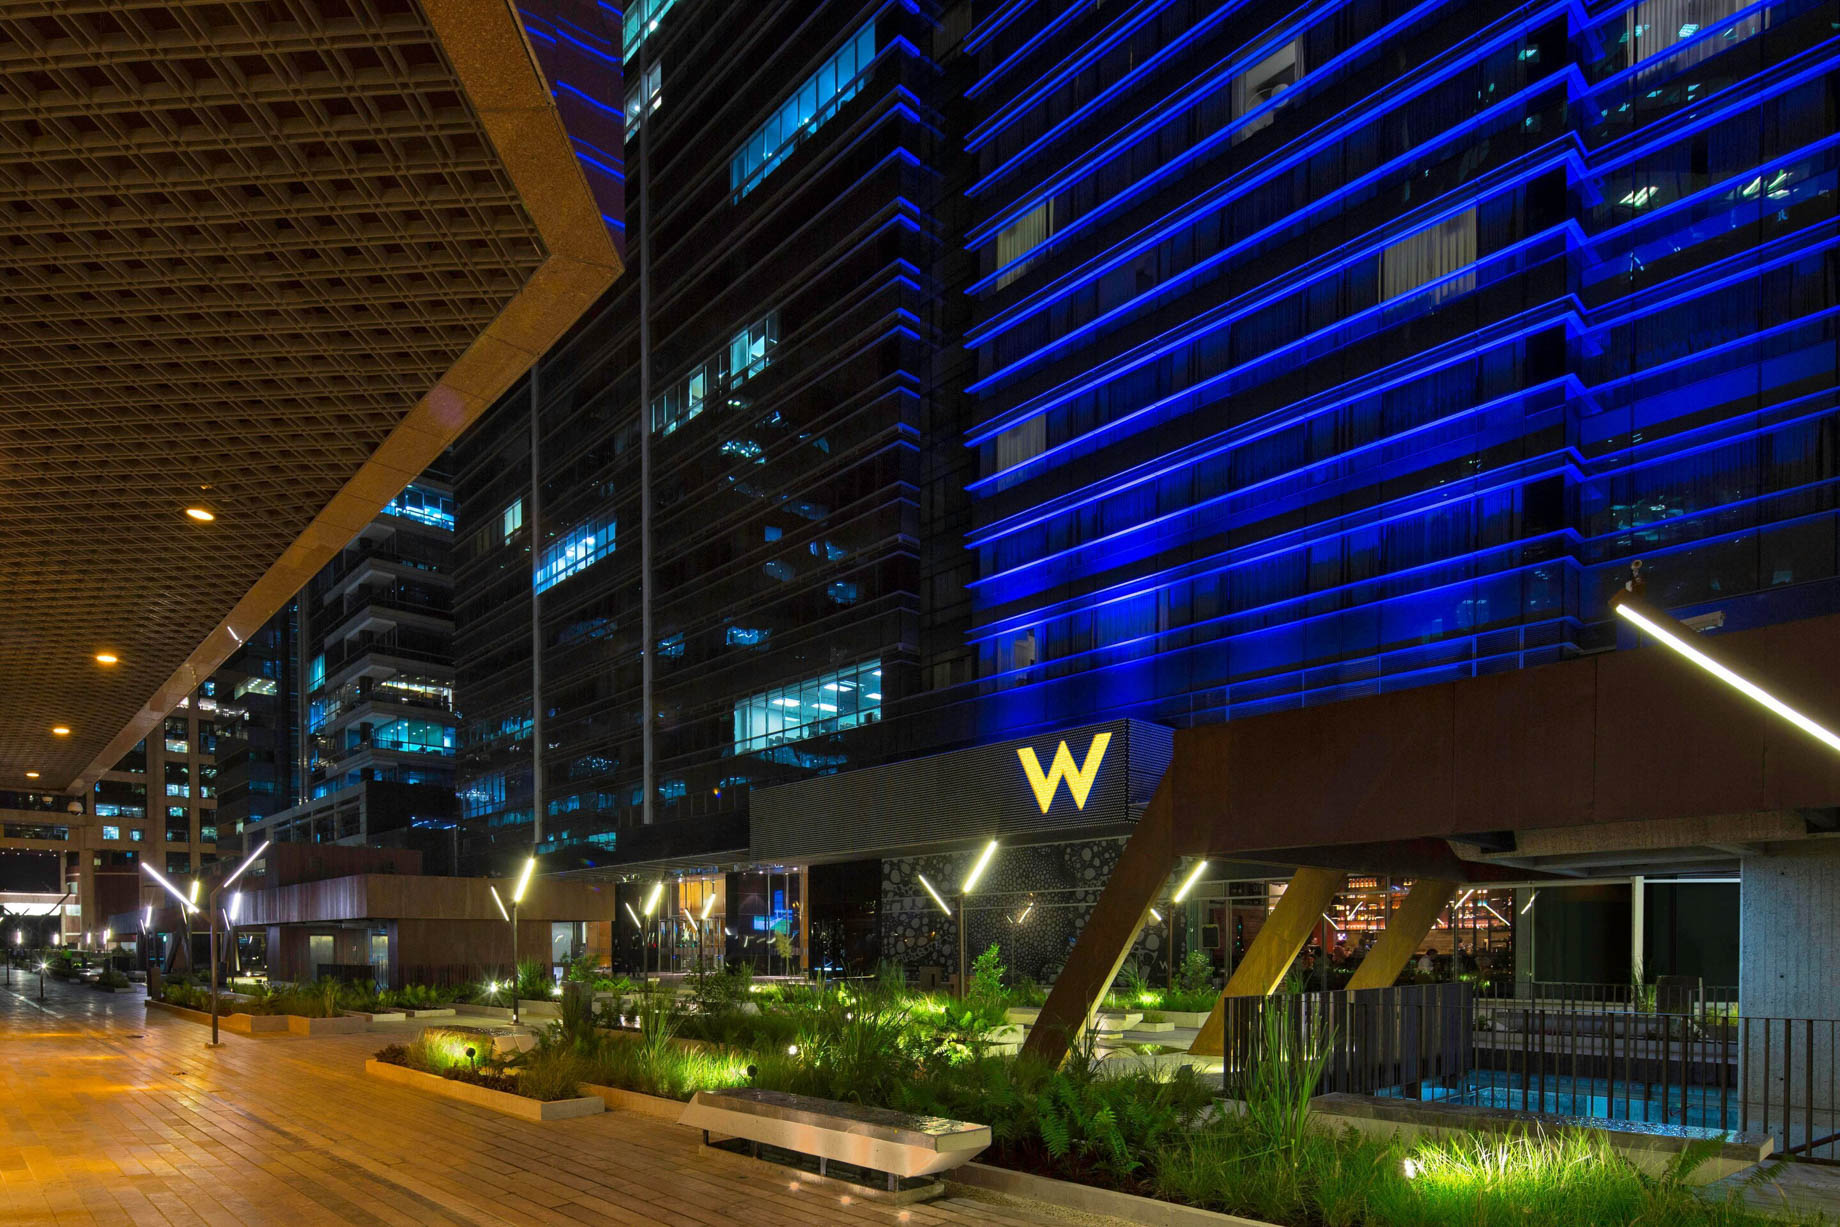 W Bogota Luxury Hotel - Bogota, Colombia - Hotel Entrance Plaza